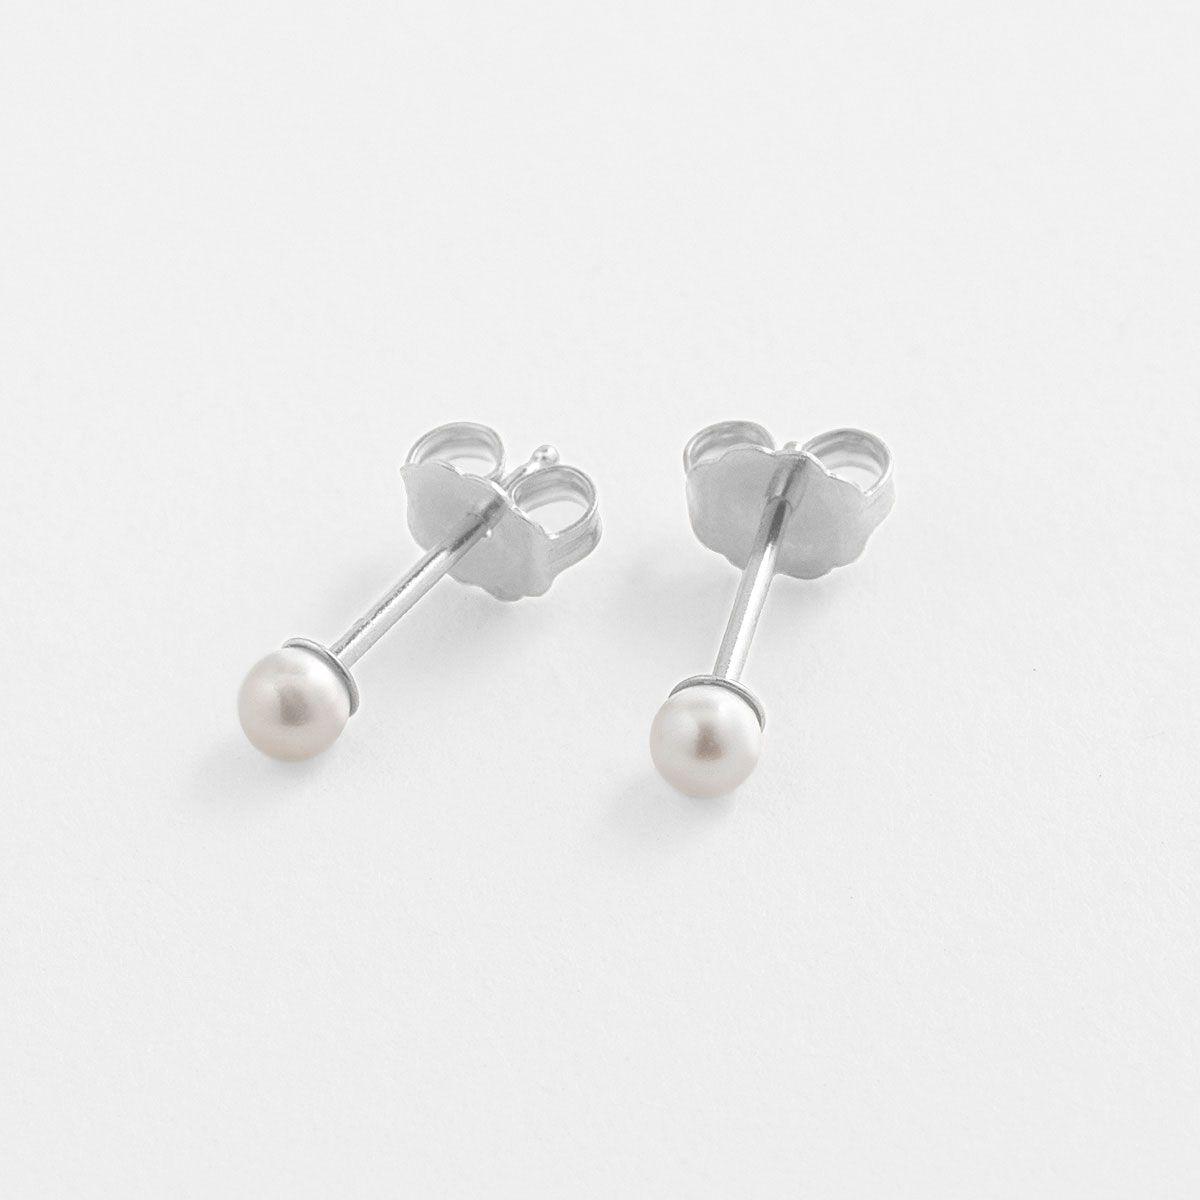 Lucia Tiny - Perlenohrringe - Silber